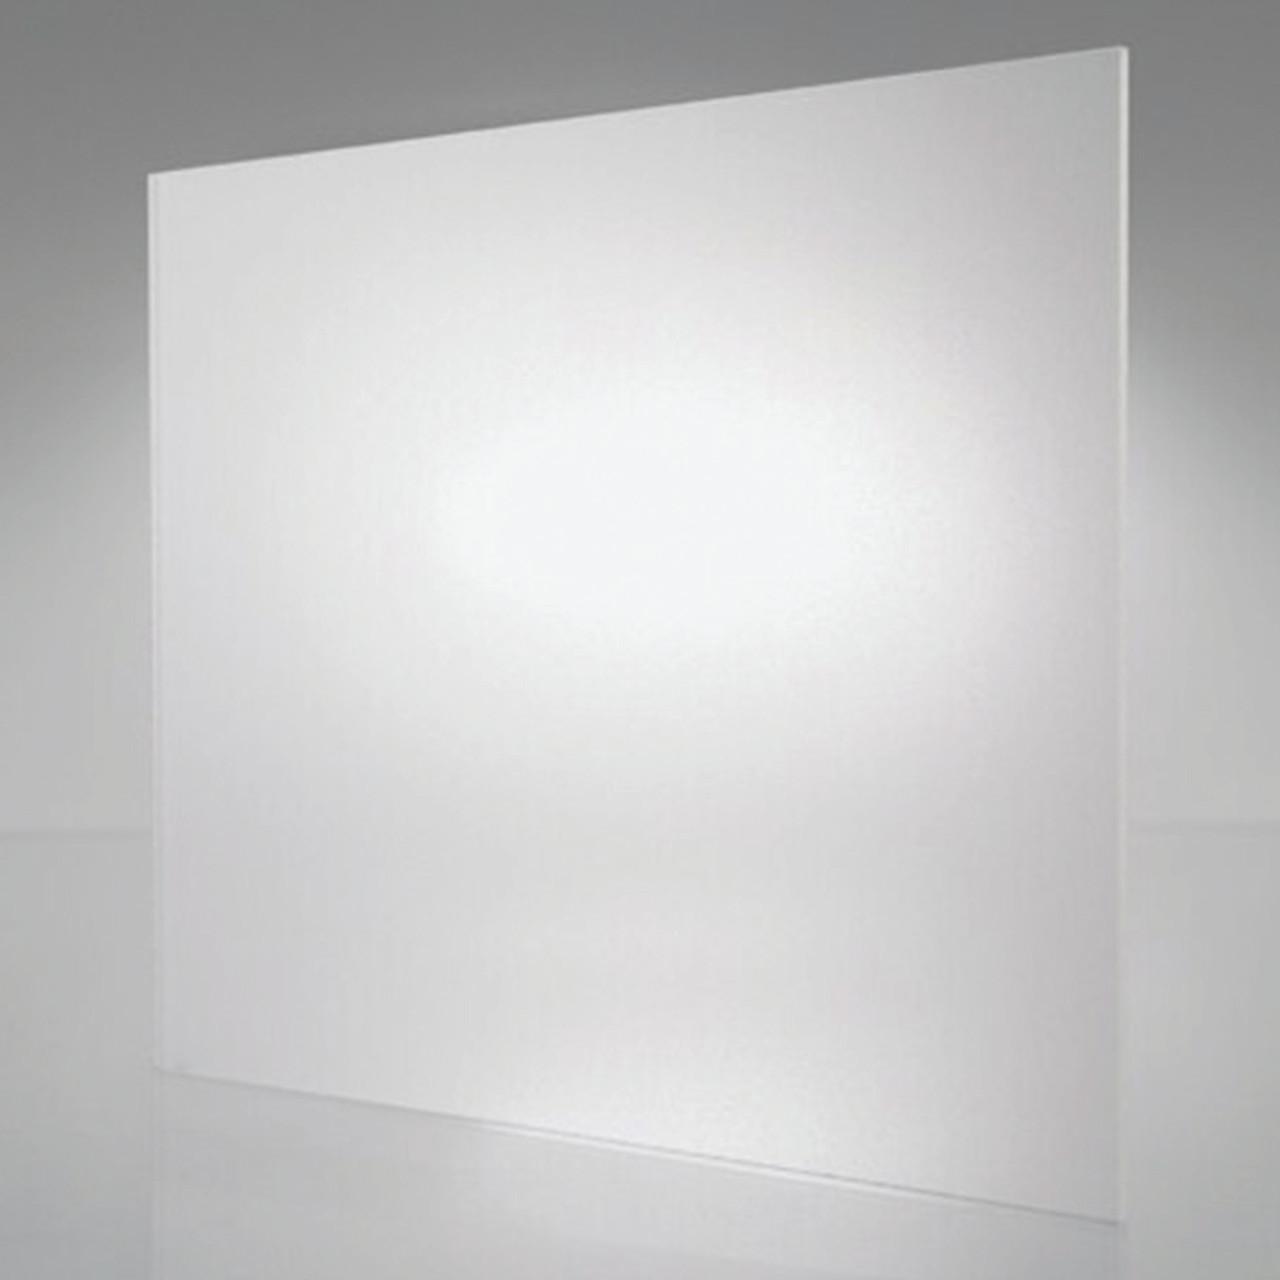 "Clear Mirror Acrylic Plexiglass sheet 1//8/"" x 8/"" x 8/"""